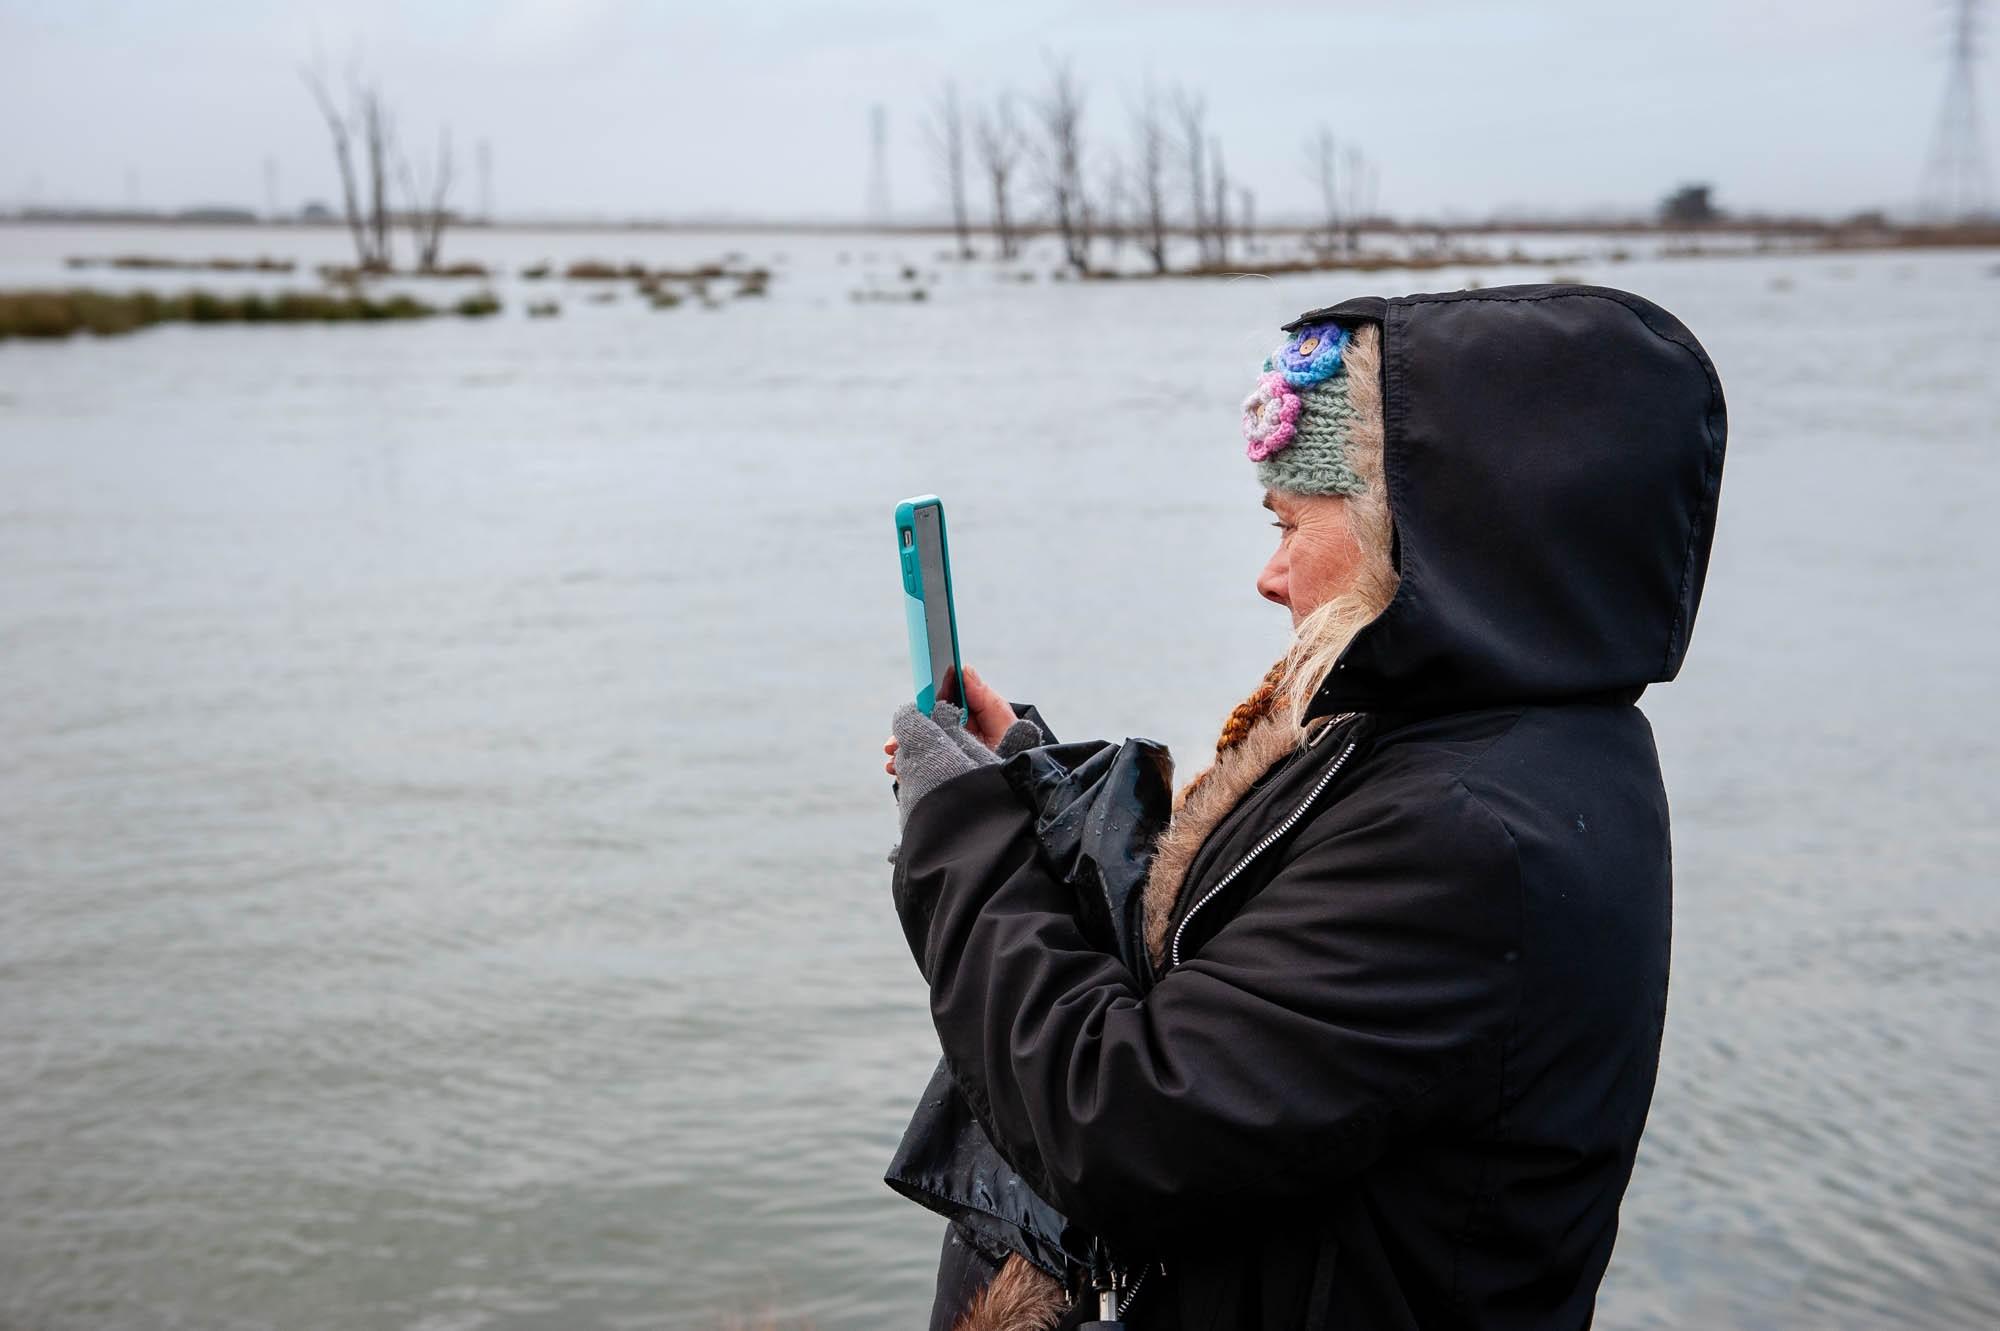 King Tide Tour Gives Glimpse of Sea Level Rise